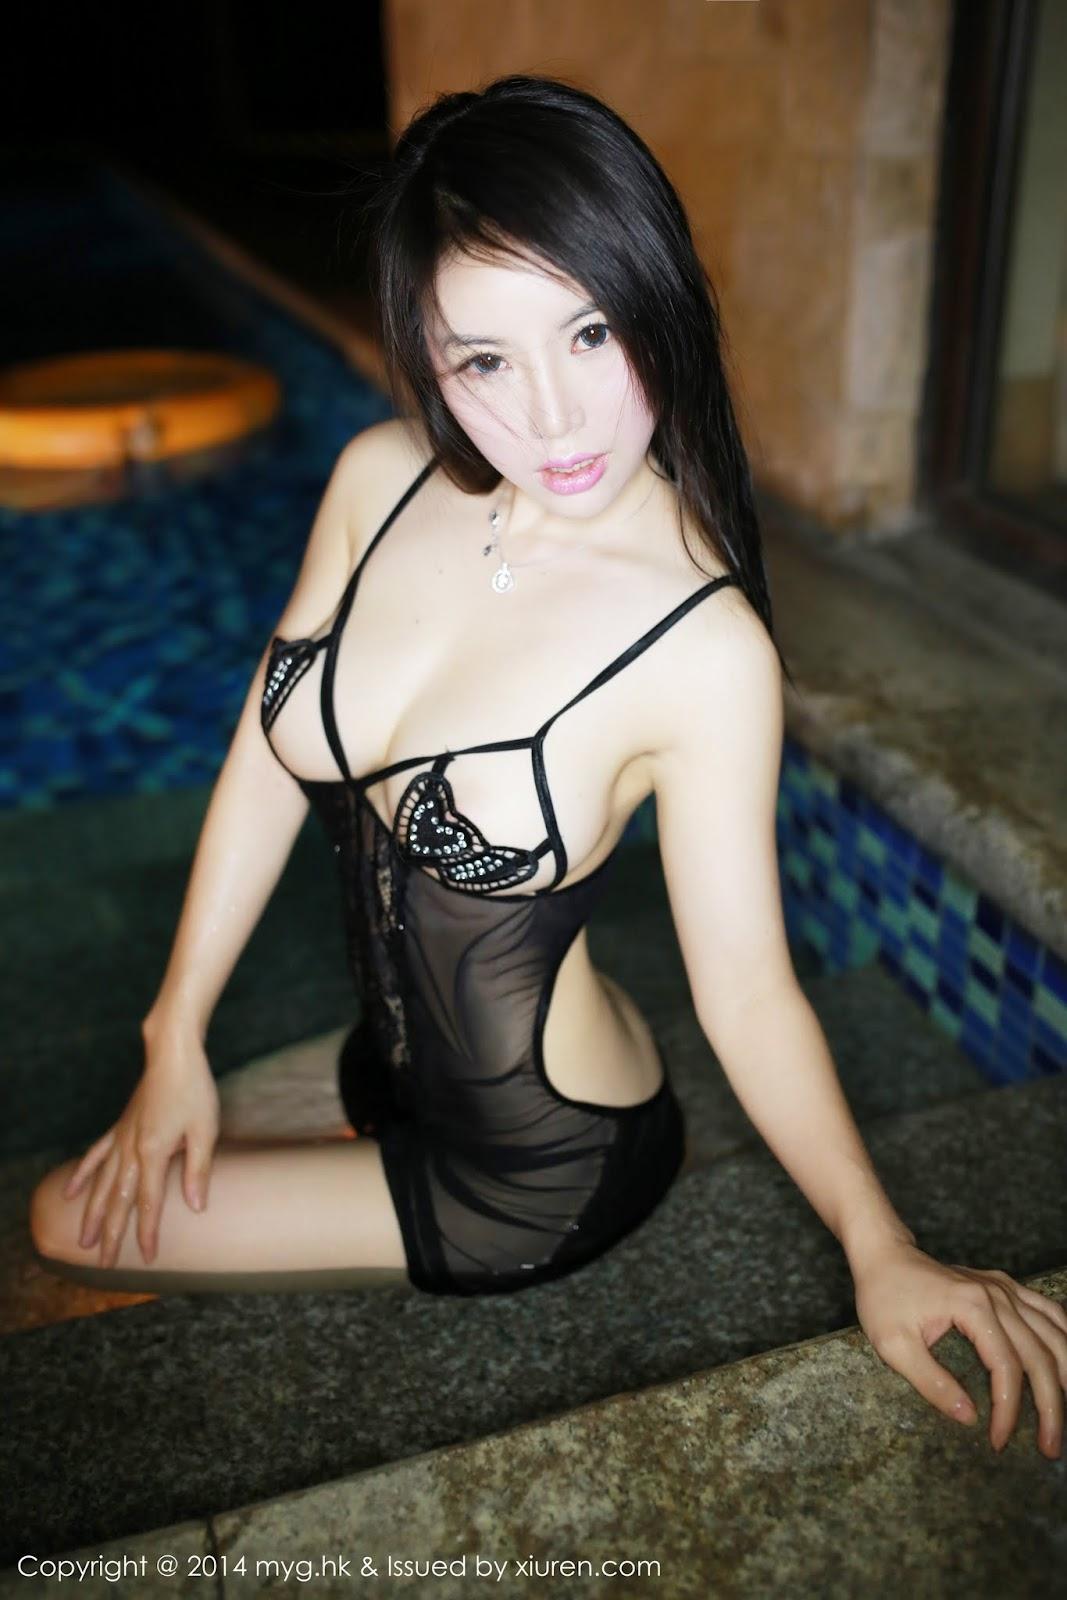 30045 066 - MYGIRL VOL.30 Photo Nude Hot Sexy